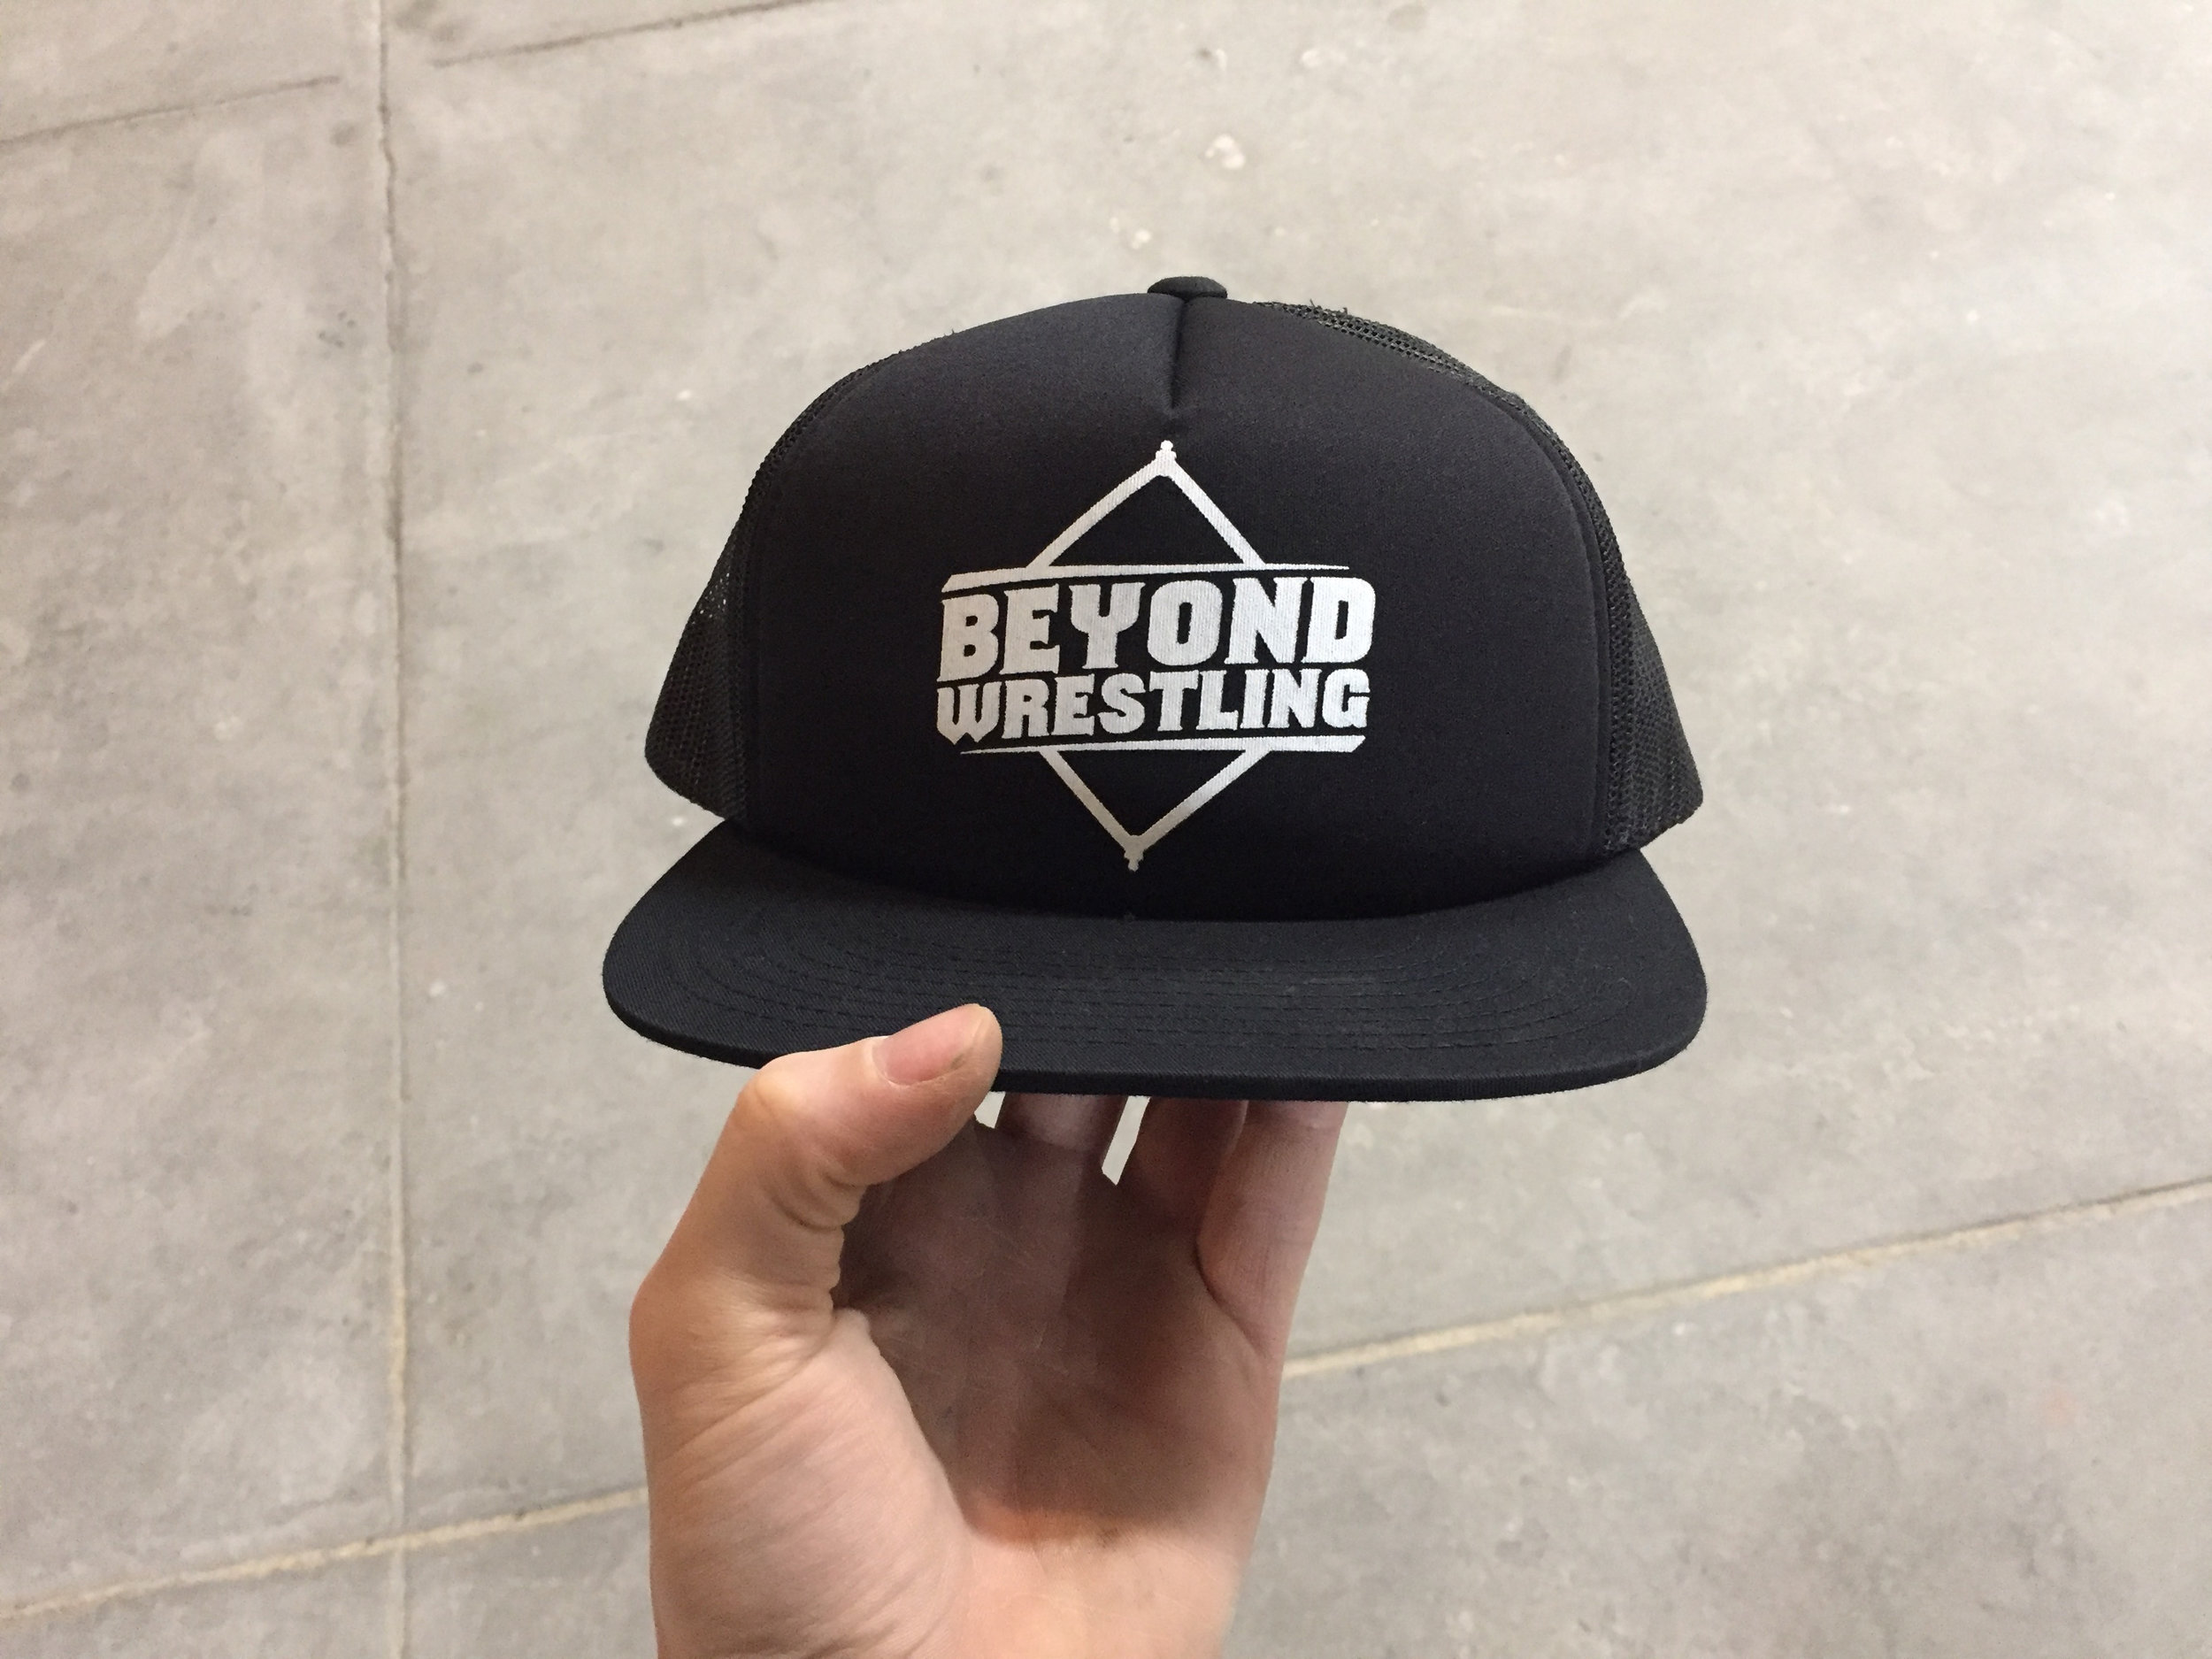 Beyond Wrestling truckerhat.jpg